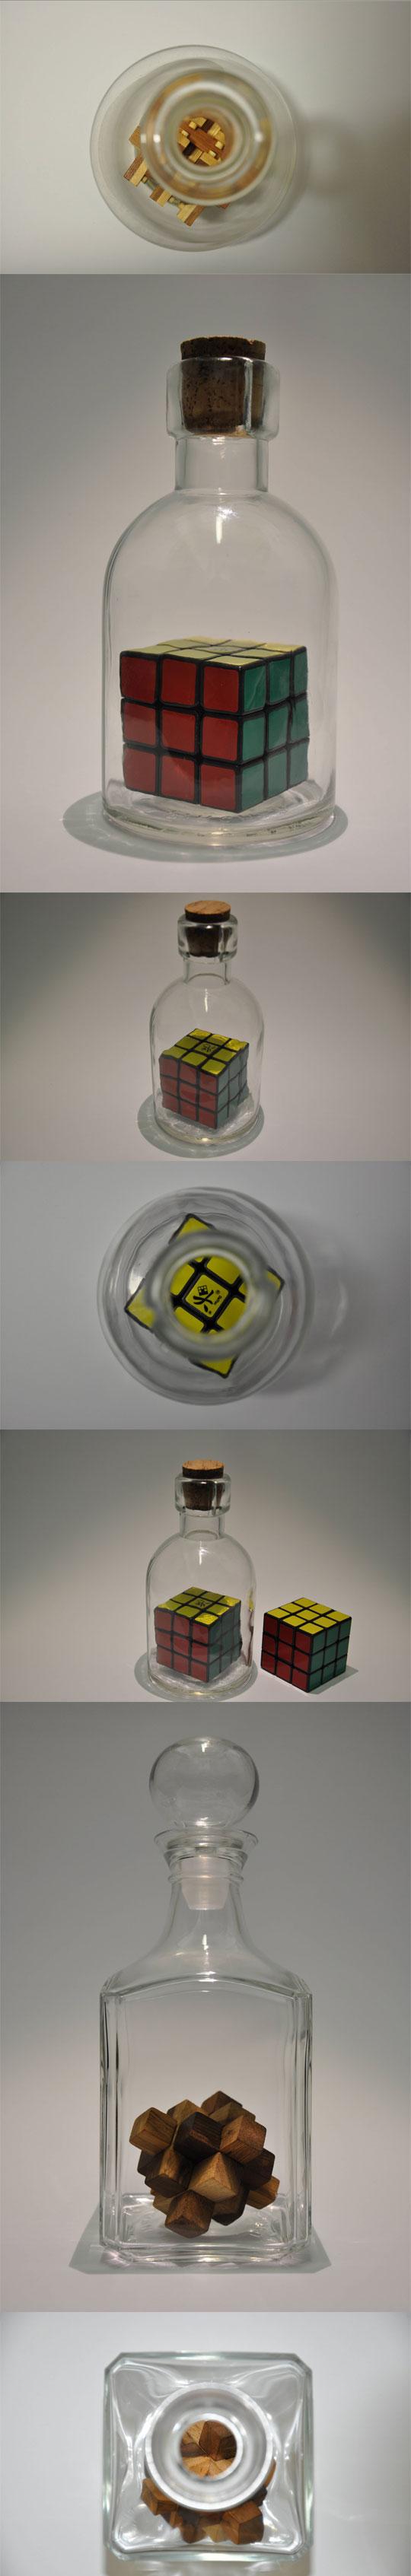 cool-puzzle-inside-bottle-illusion-Rubik